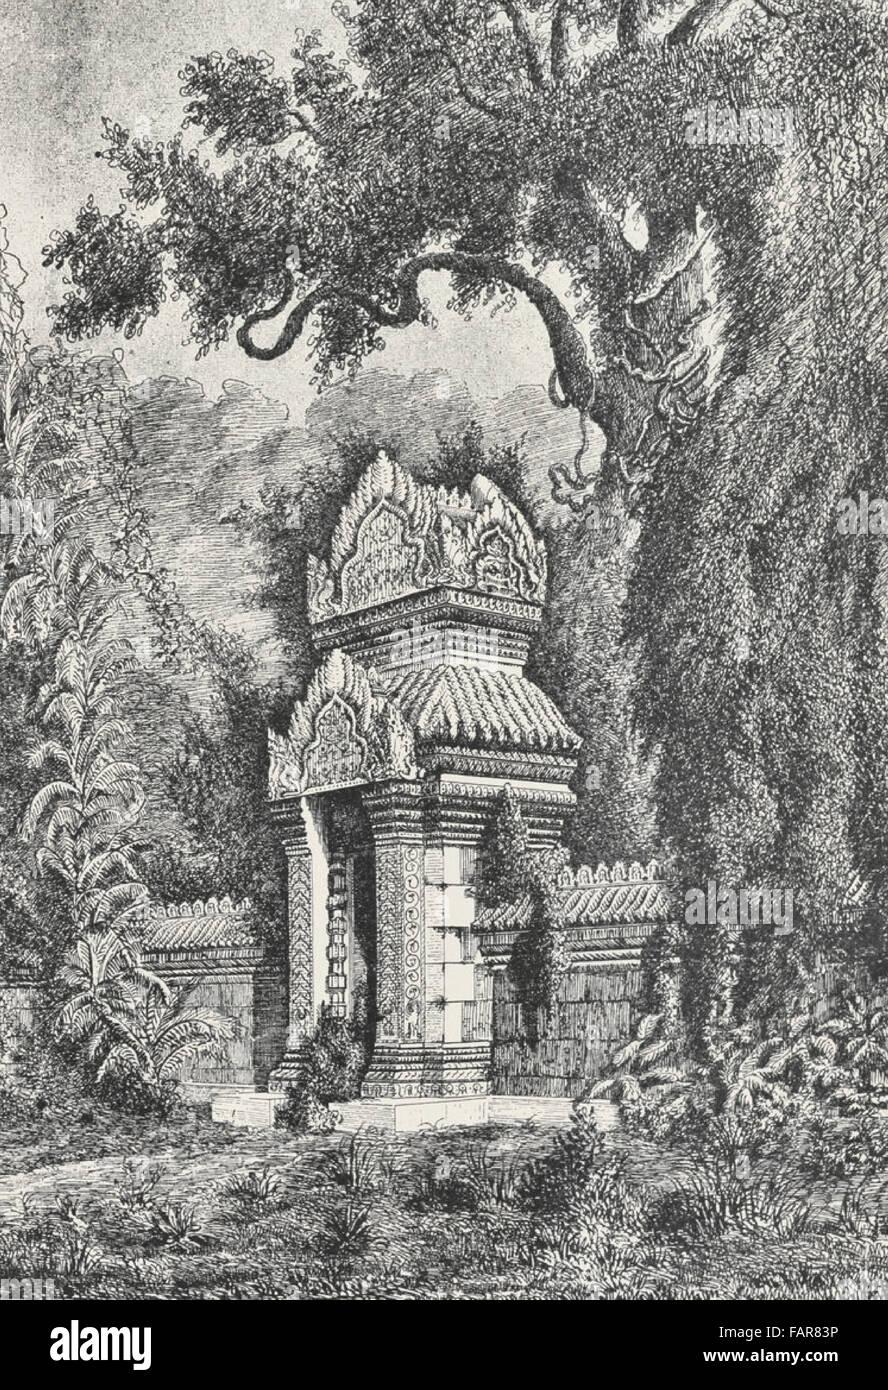 View Taking In The Ruins Presat - Pram . The north gate, Cambodia, circa 1880 - Stock Image